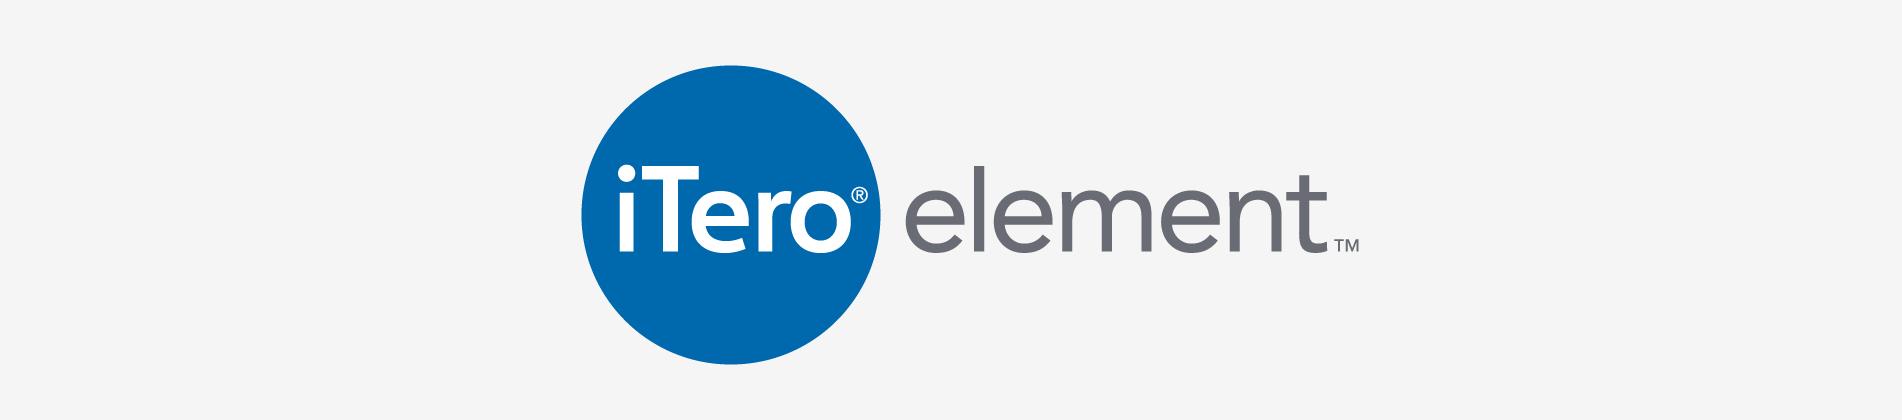 TD-align-iTero-logo-slide.png